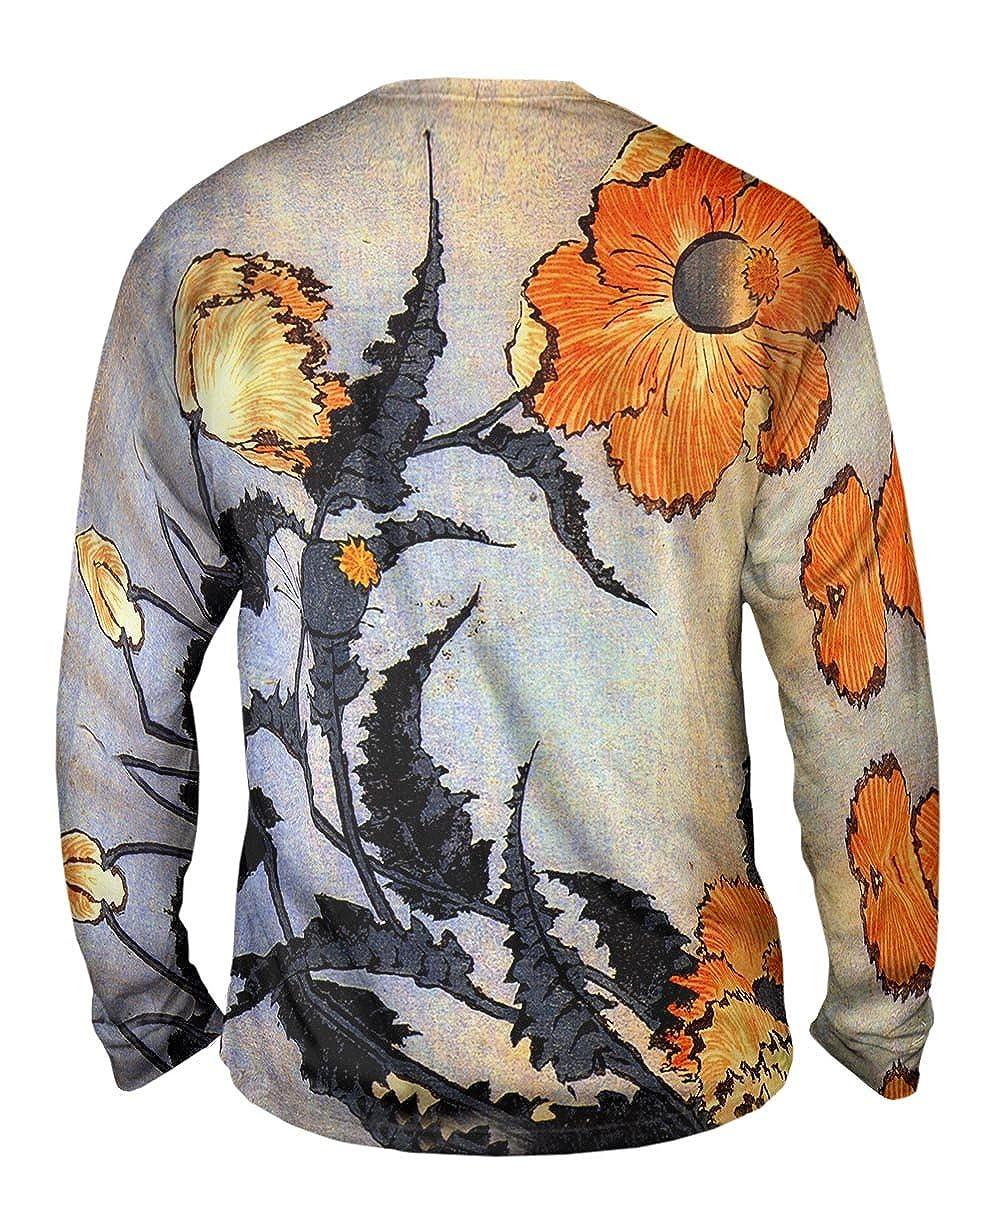 TShirt Mens Long Sleeve Yizzam Katsushika Hokusai Poppy